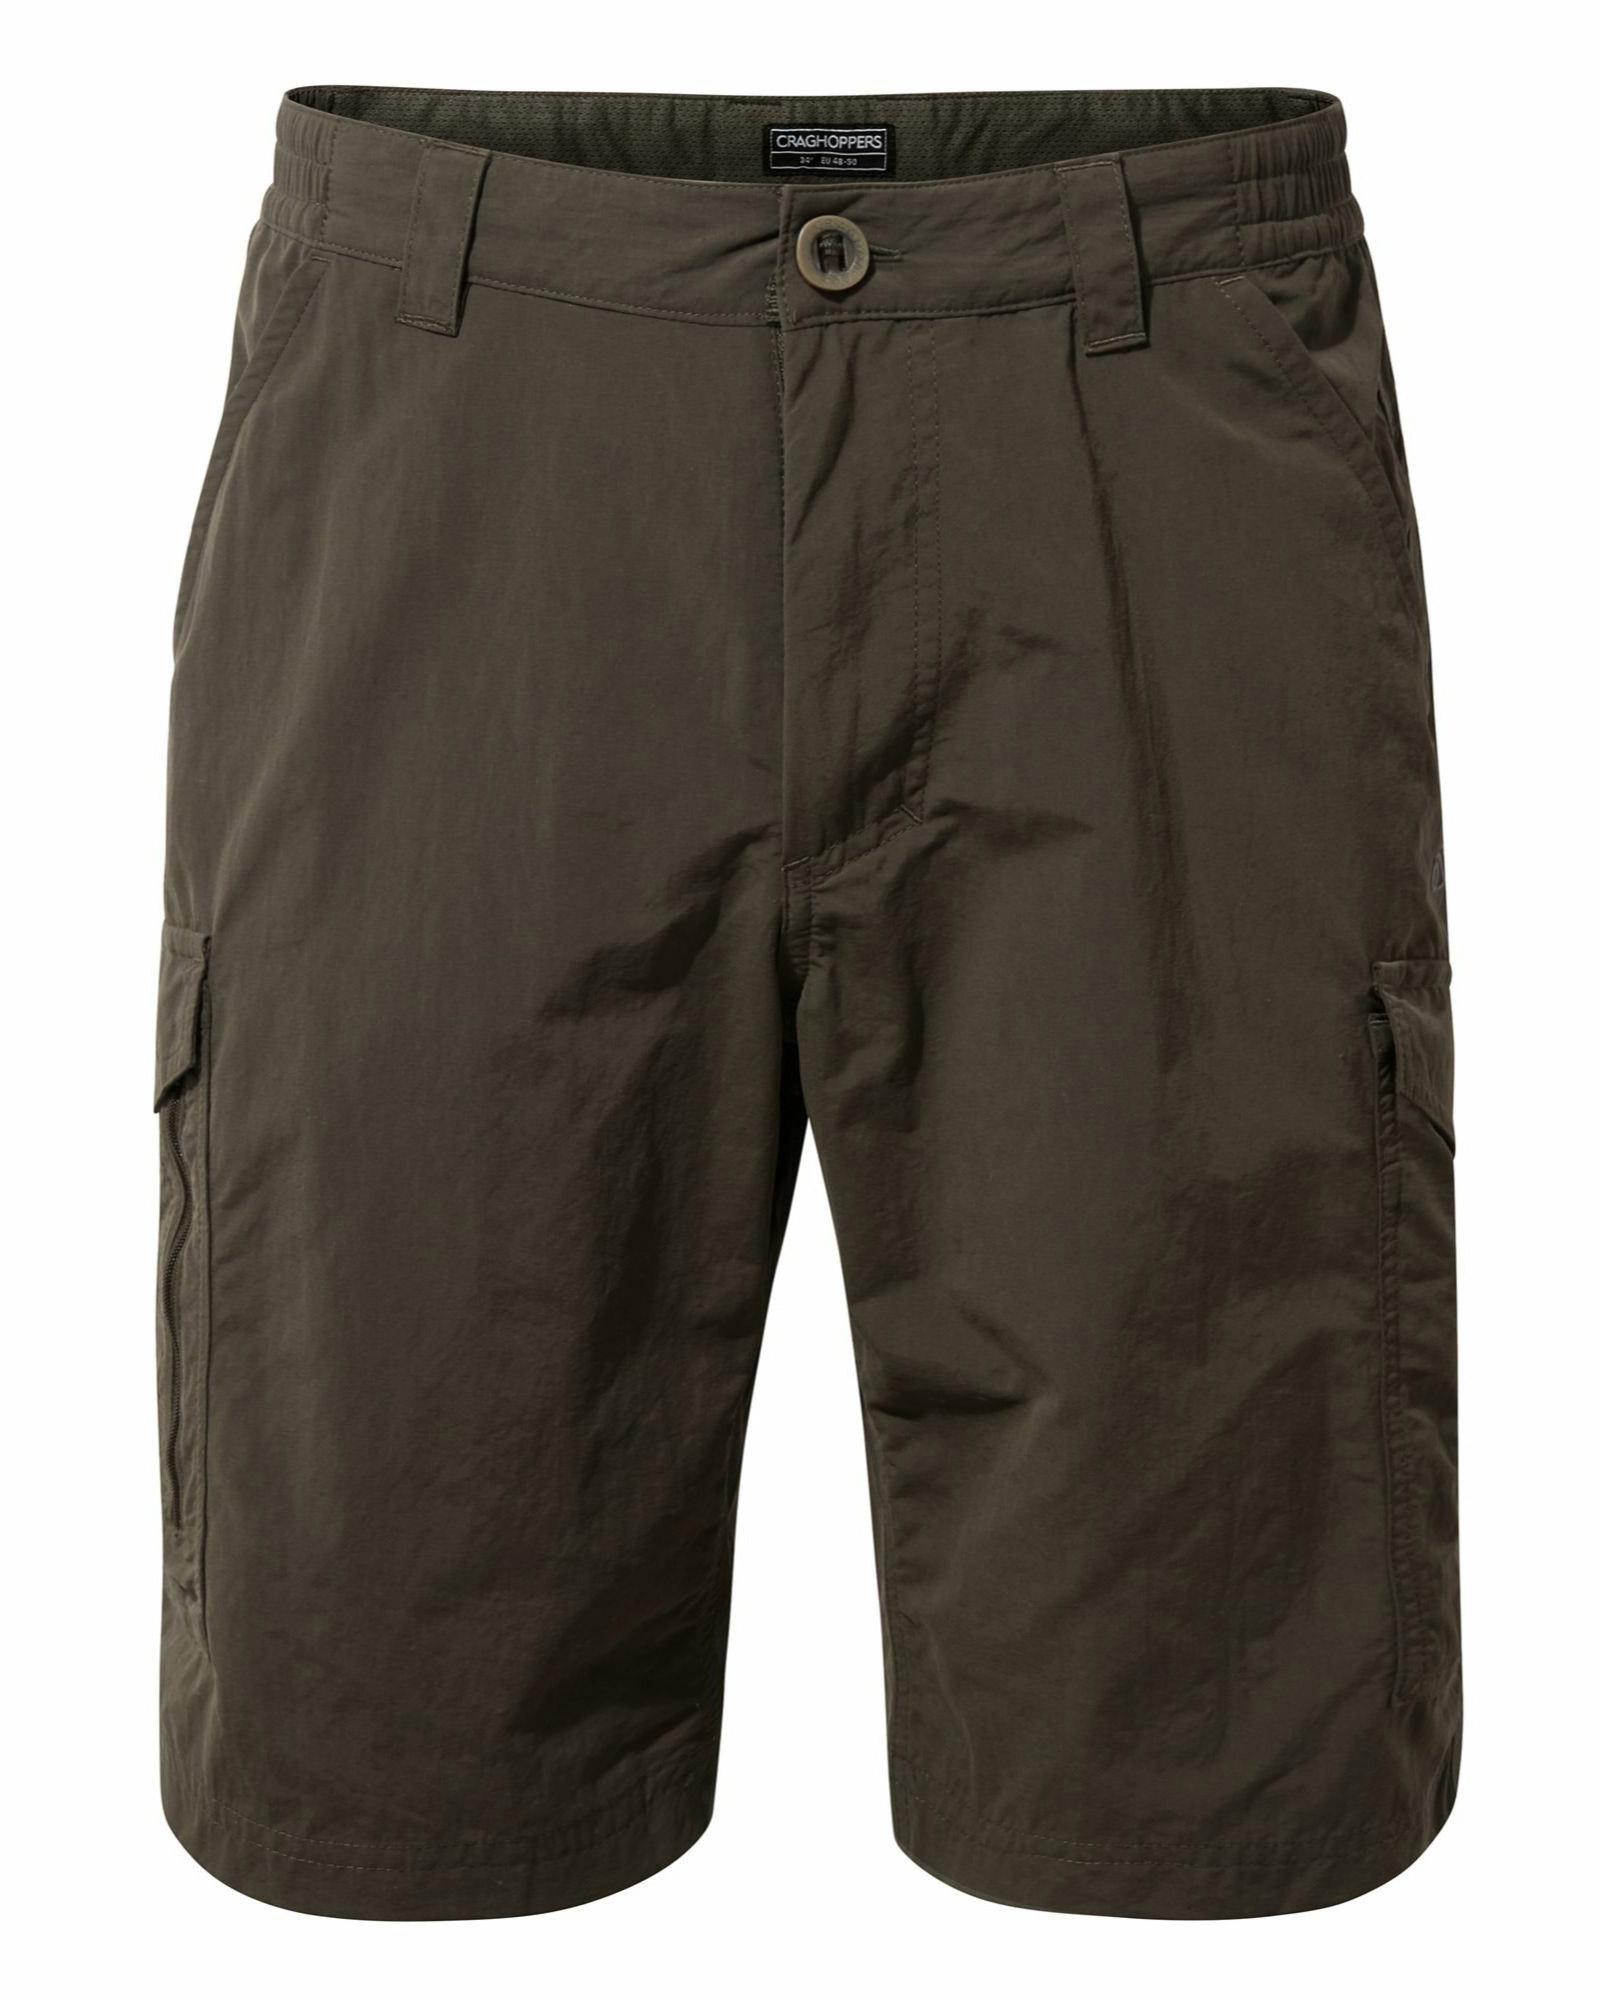 Product image of Craghoppers Men's NosiLife Cargo Shorts